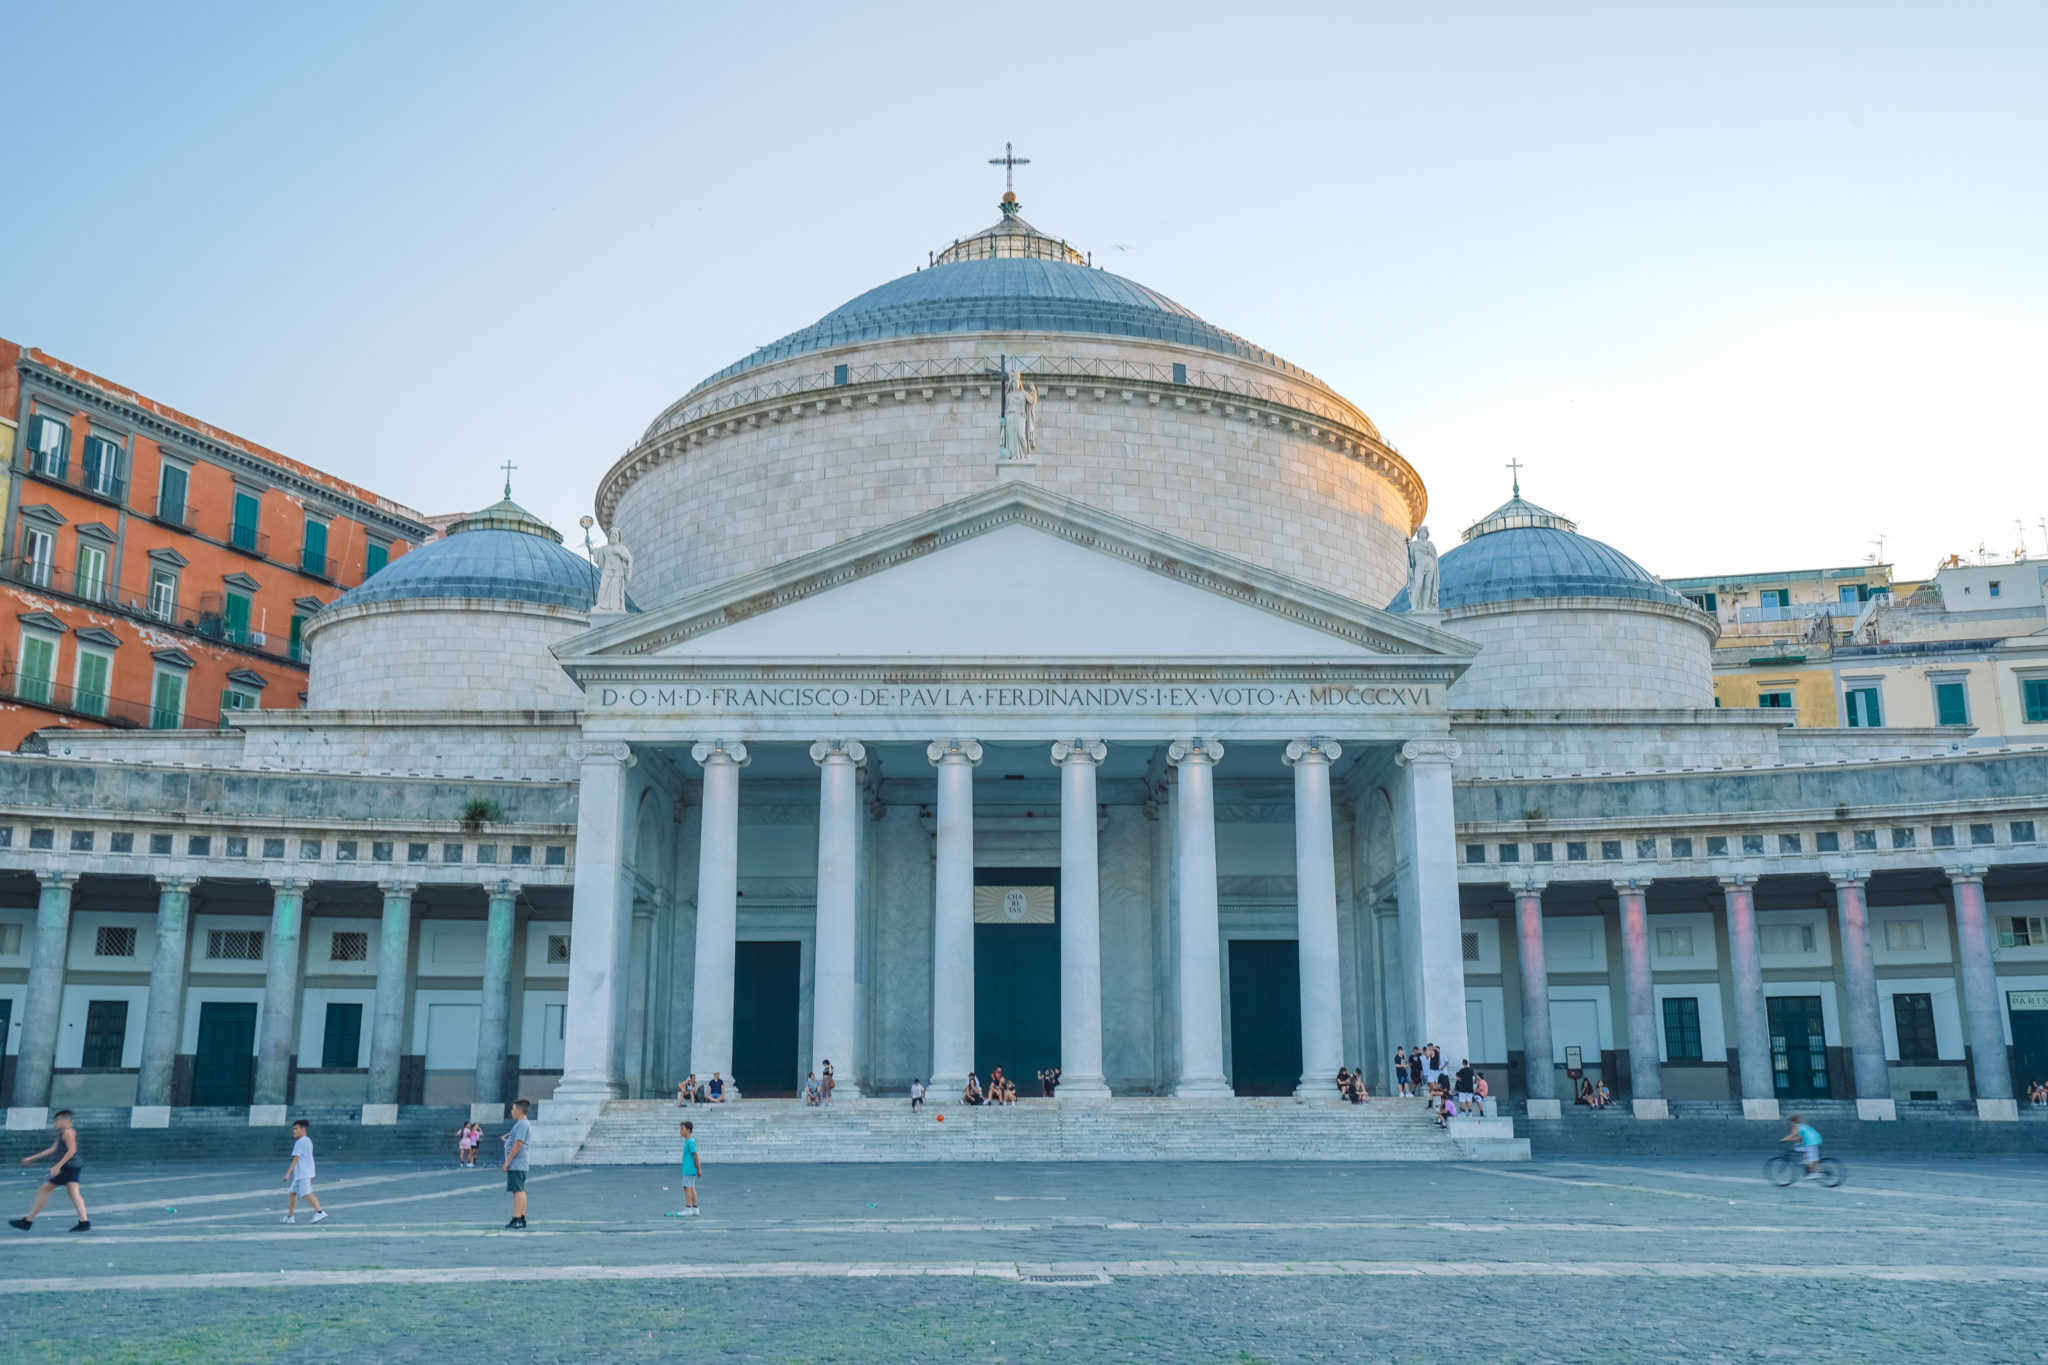 naples-visiter-city-guide-piazza-plebiscito